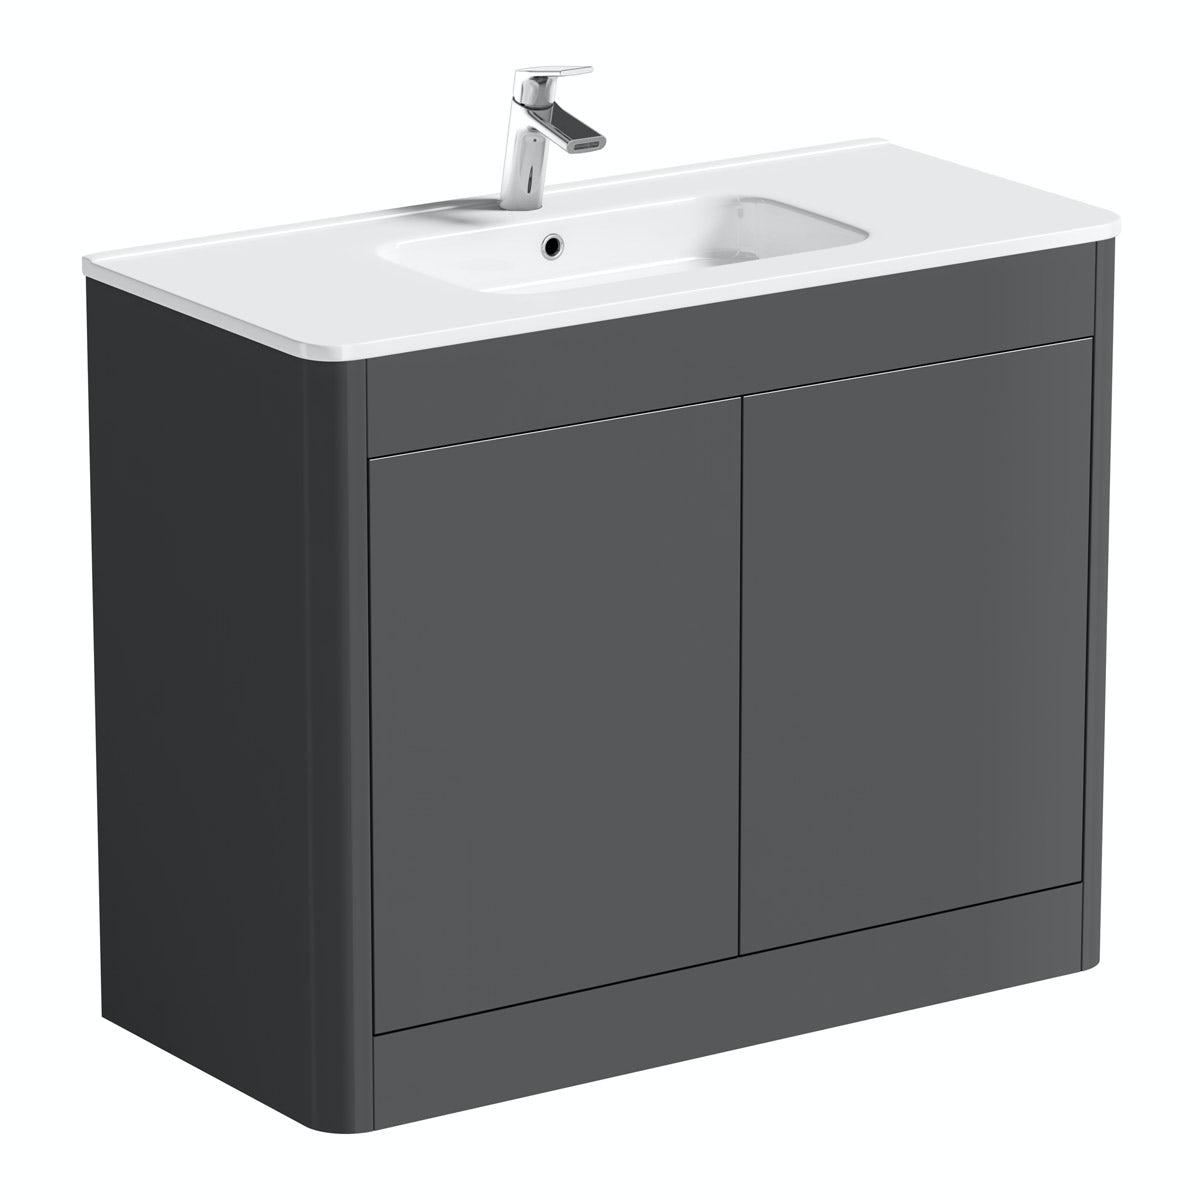 Mode Carter slate vanity unit and basin 1000mm